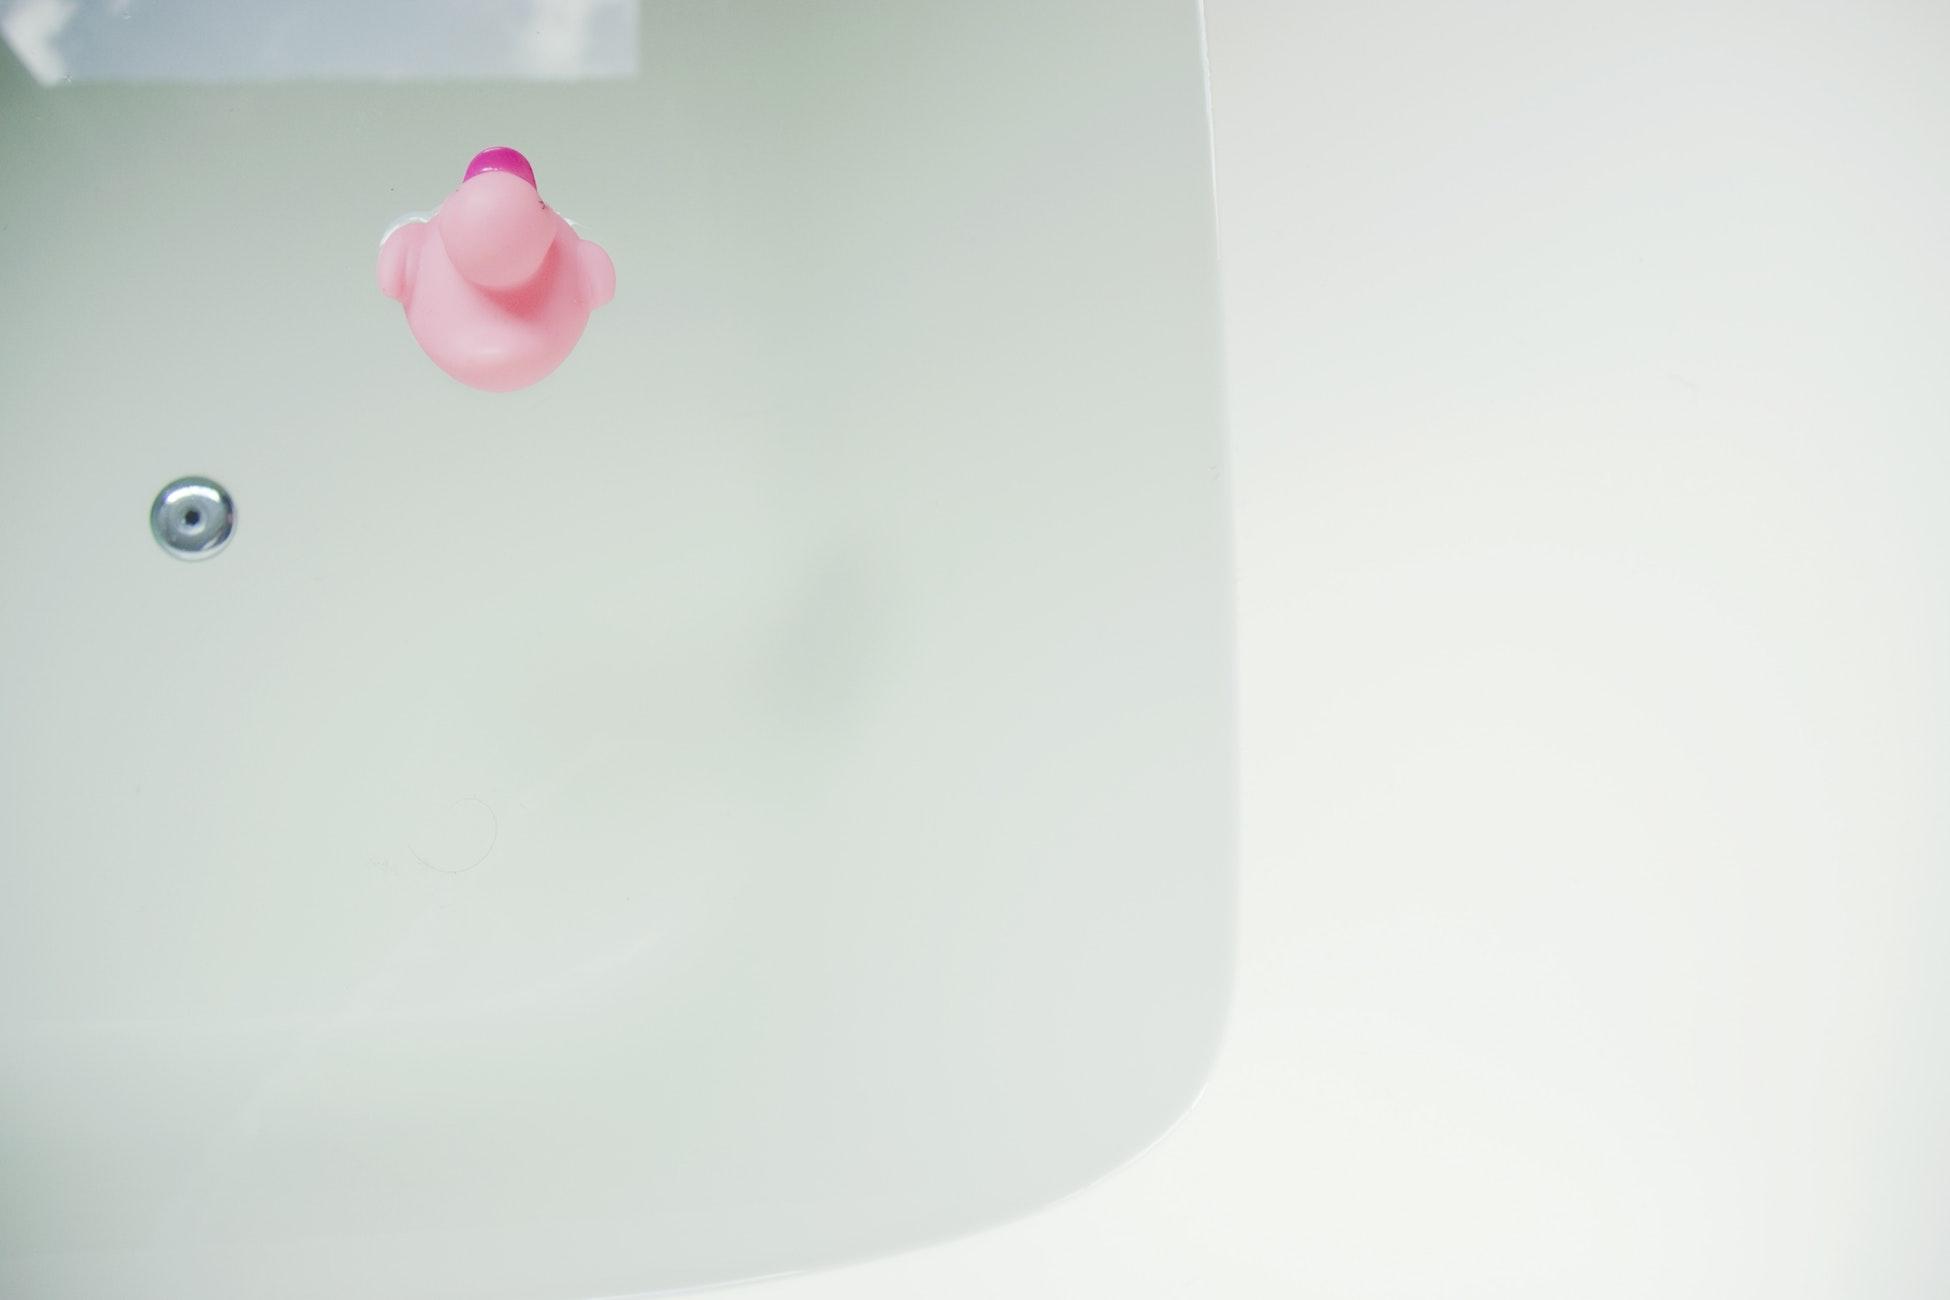 Pink rubber duck in bath tub.